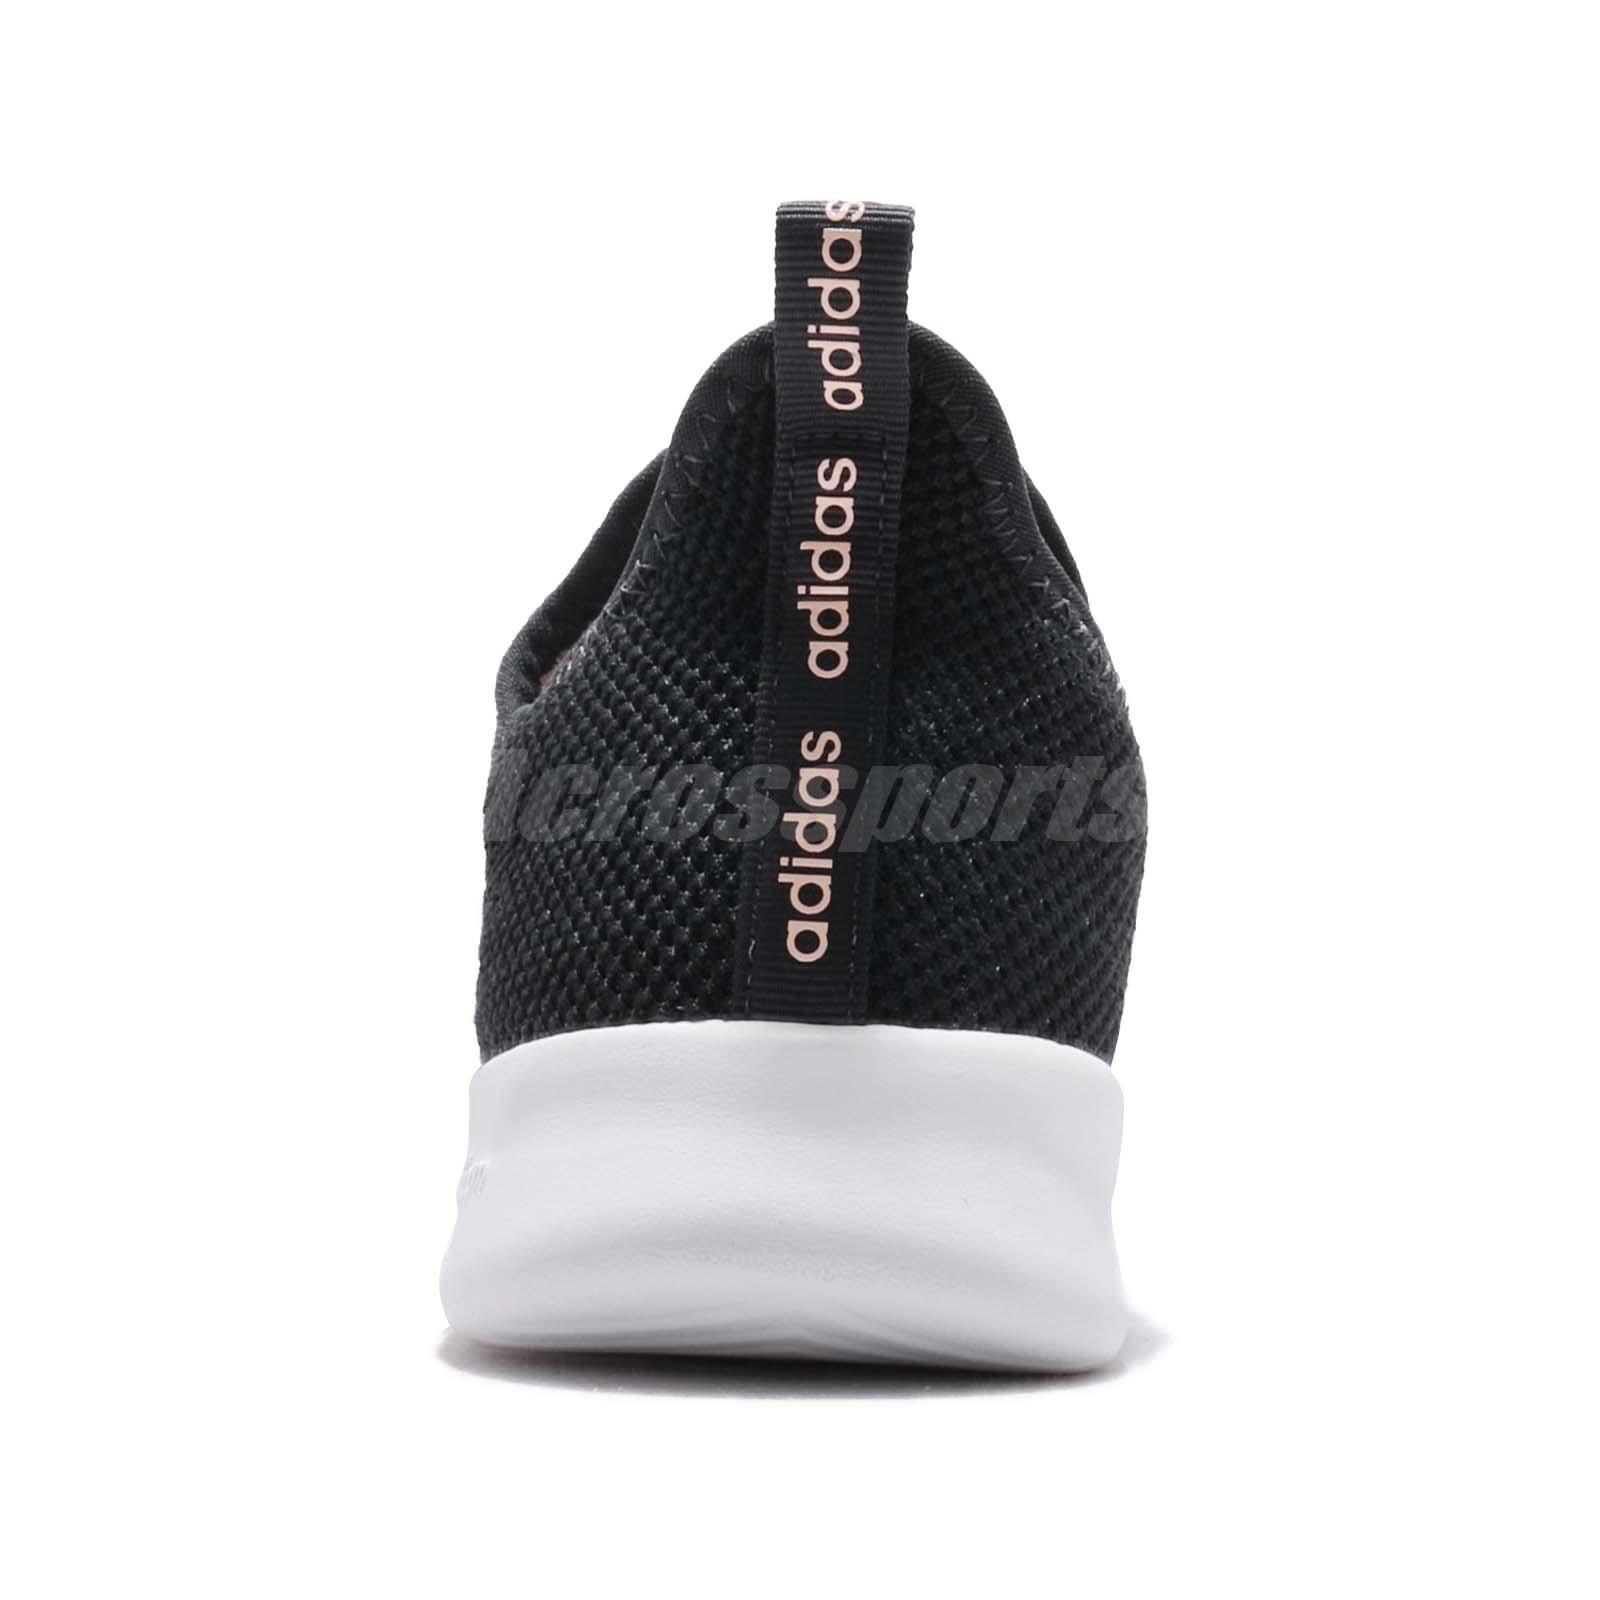 adidas Cloudfoam Pure Carbon Haze Coral Women Running Shoes Sneakers ... 8e15313d6